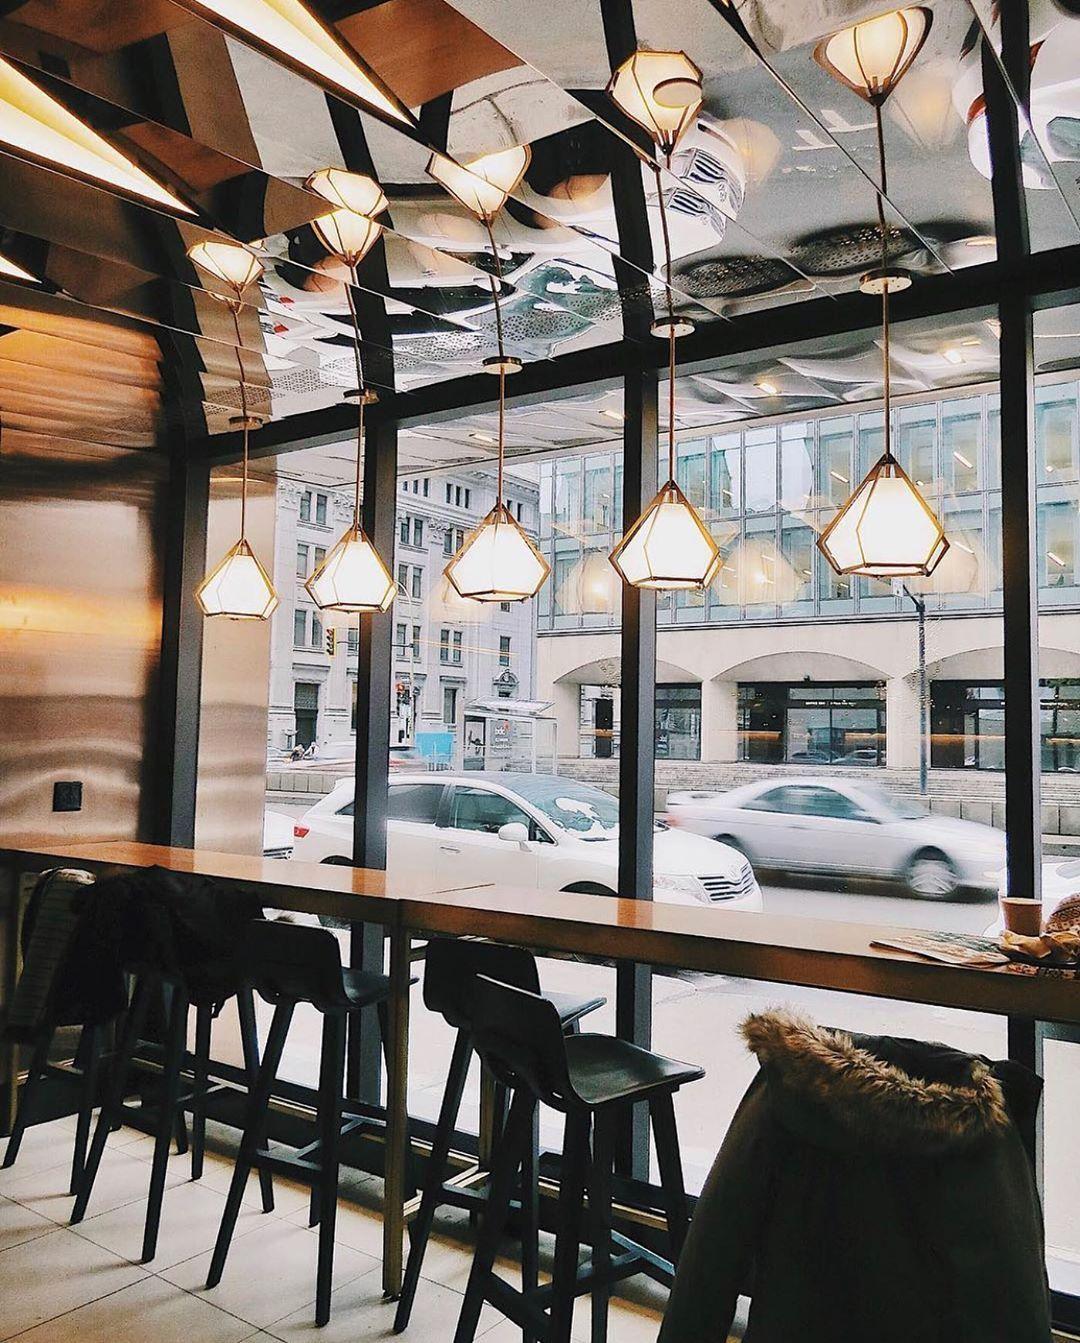 Krema Downtown Mtl Th3rdwave Cafe Coffeeshop Th3rdwave